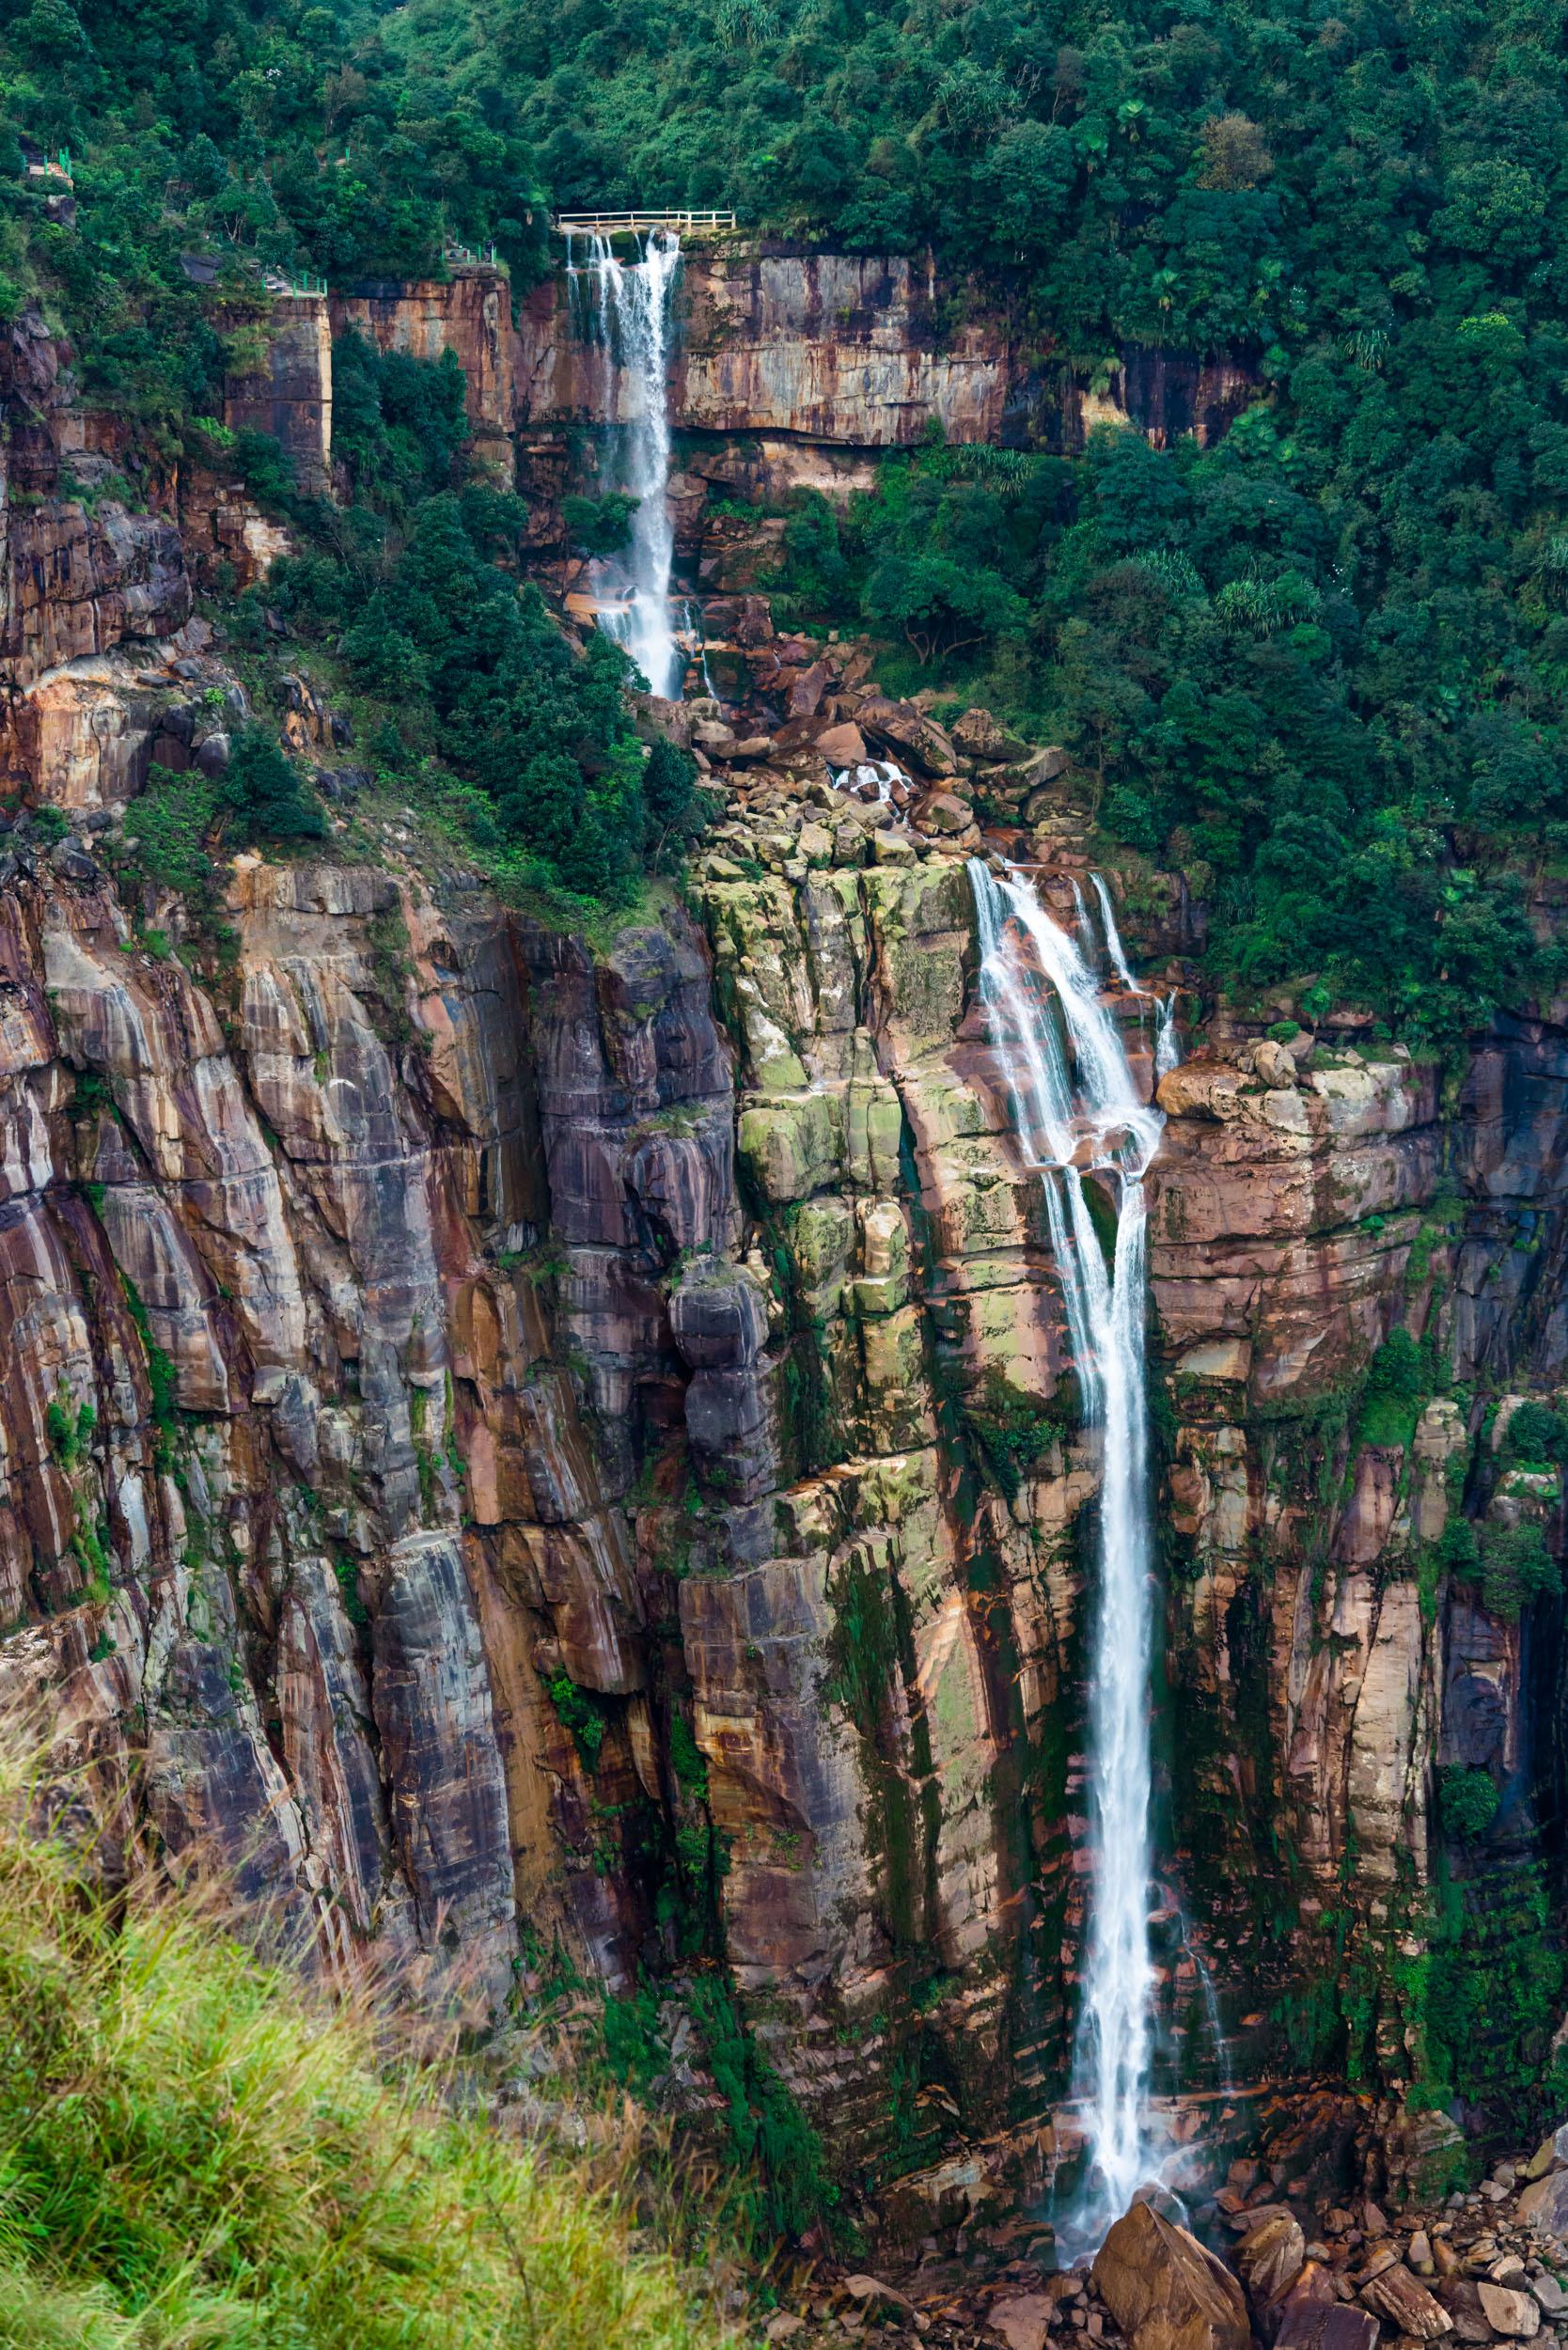 Dainthlen waterfalls